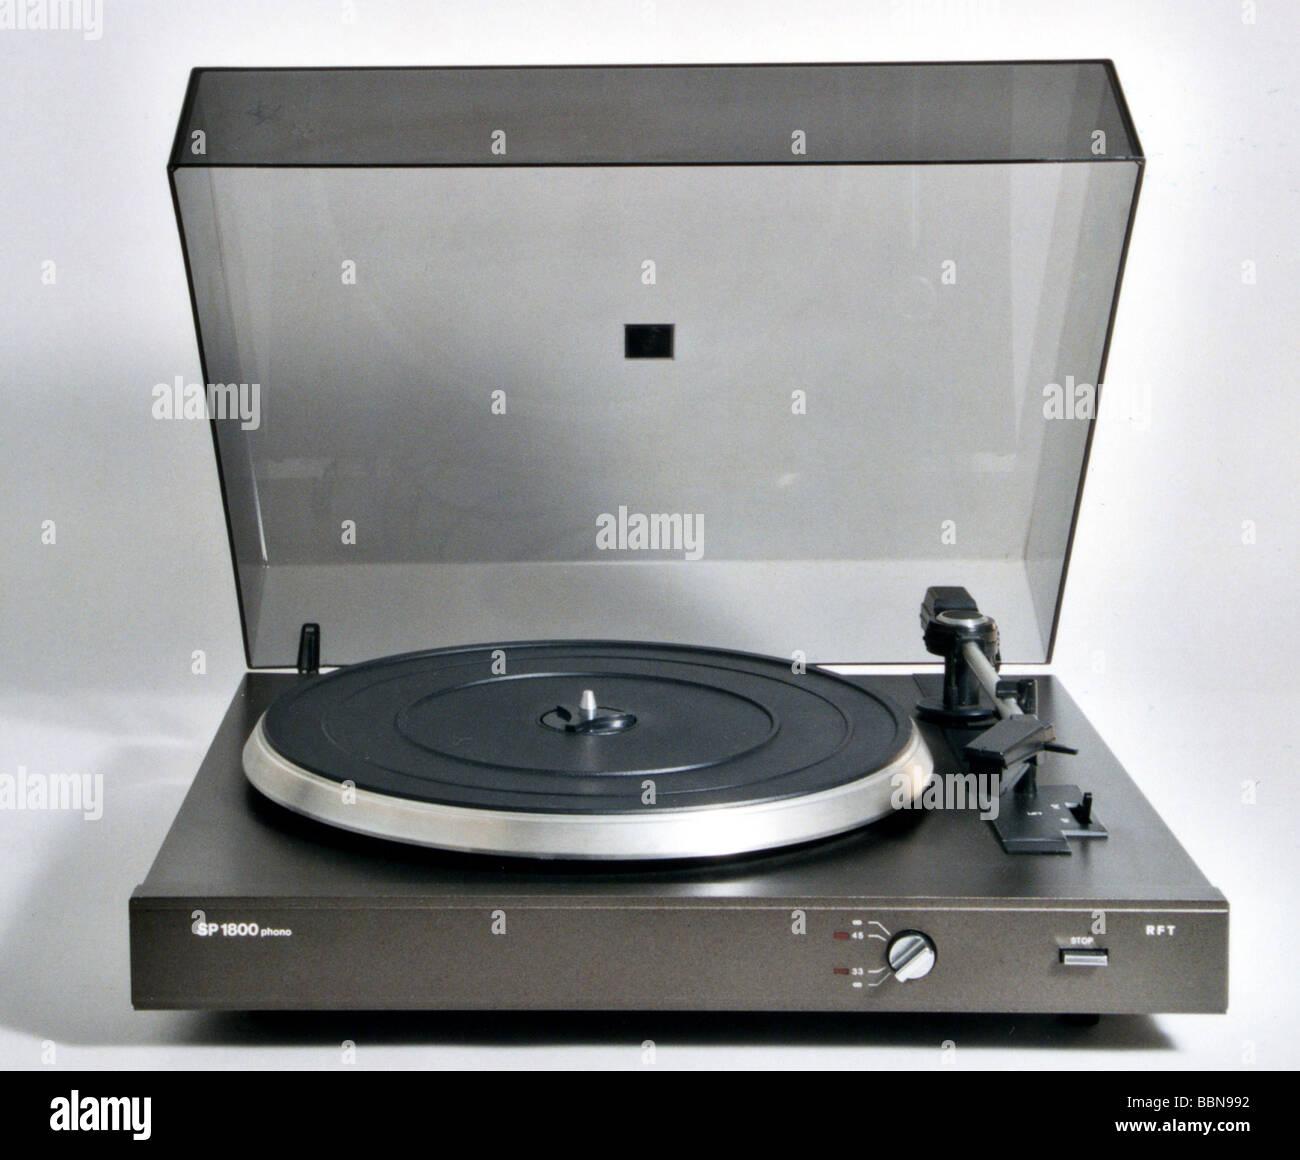 technics, full automatic stereo record player SP 1800, made by VEB Phonotechnik Zittau-Pirna, GDR, 1985, historic, - Stock Image